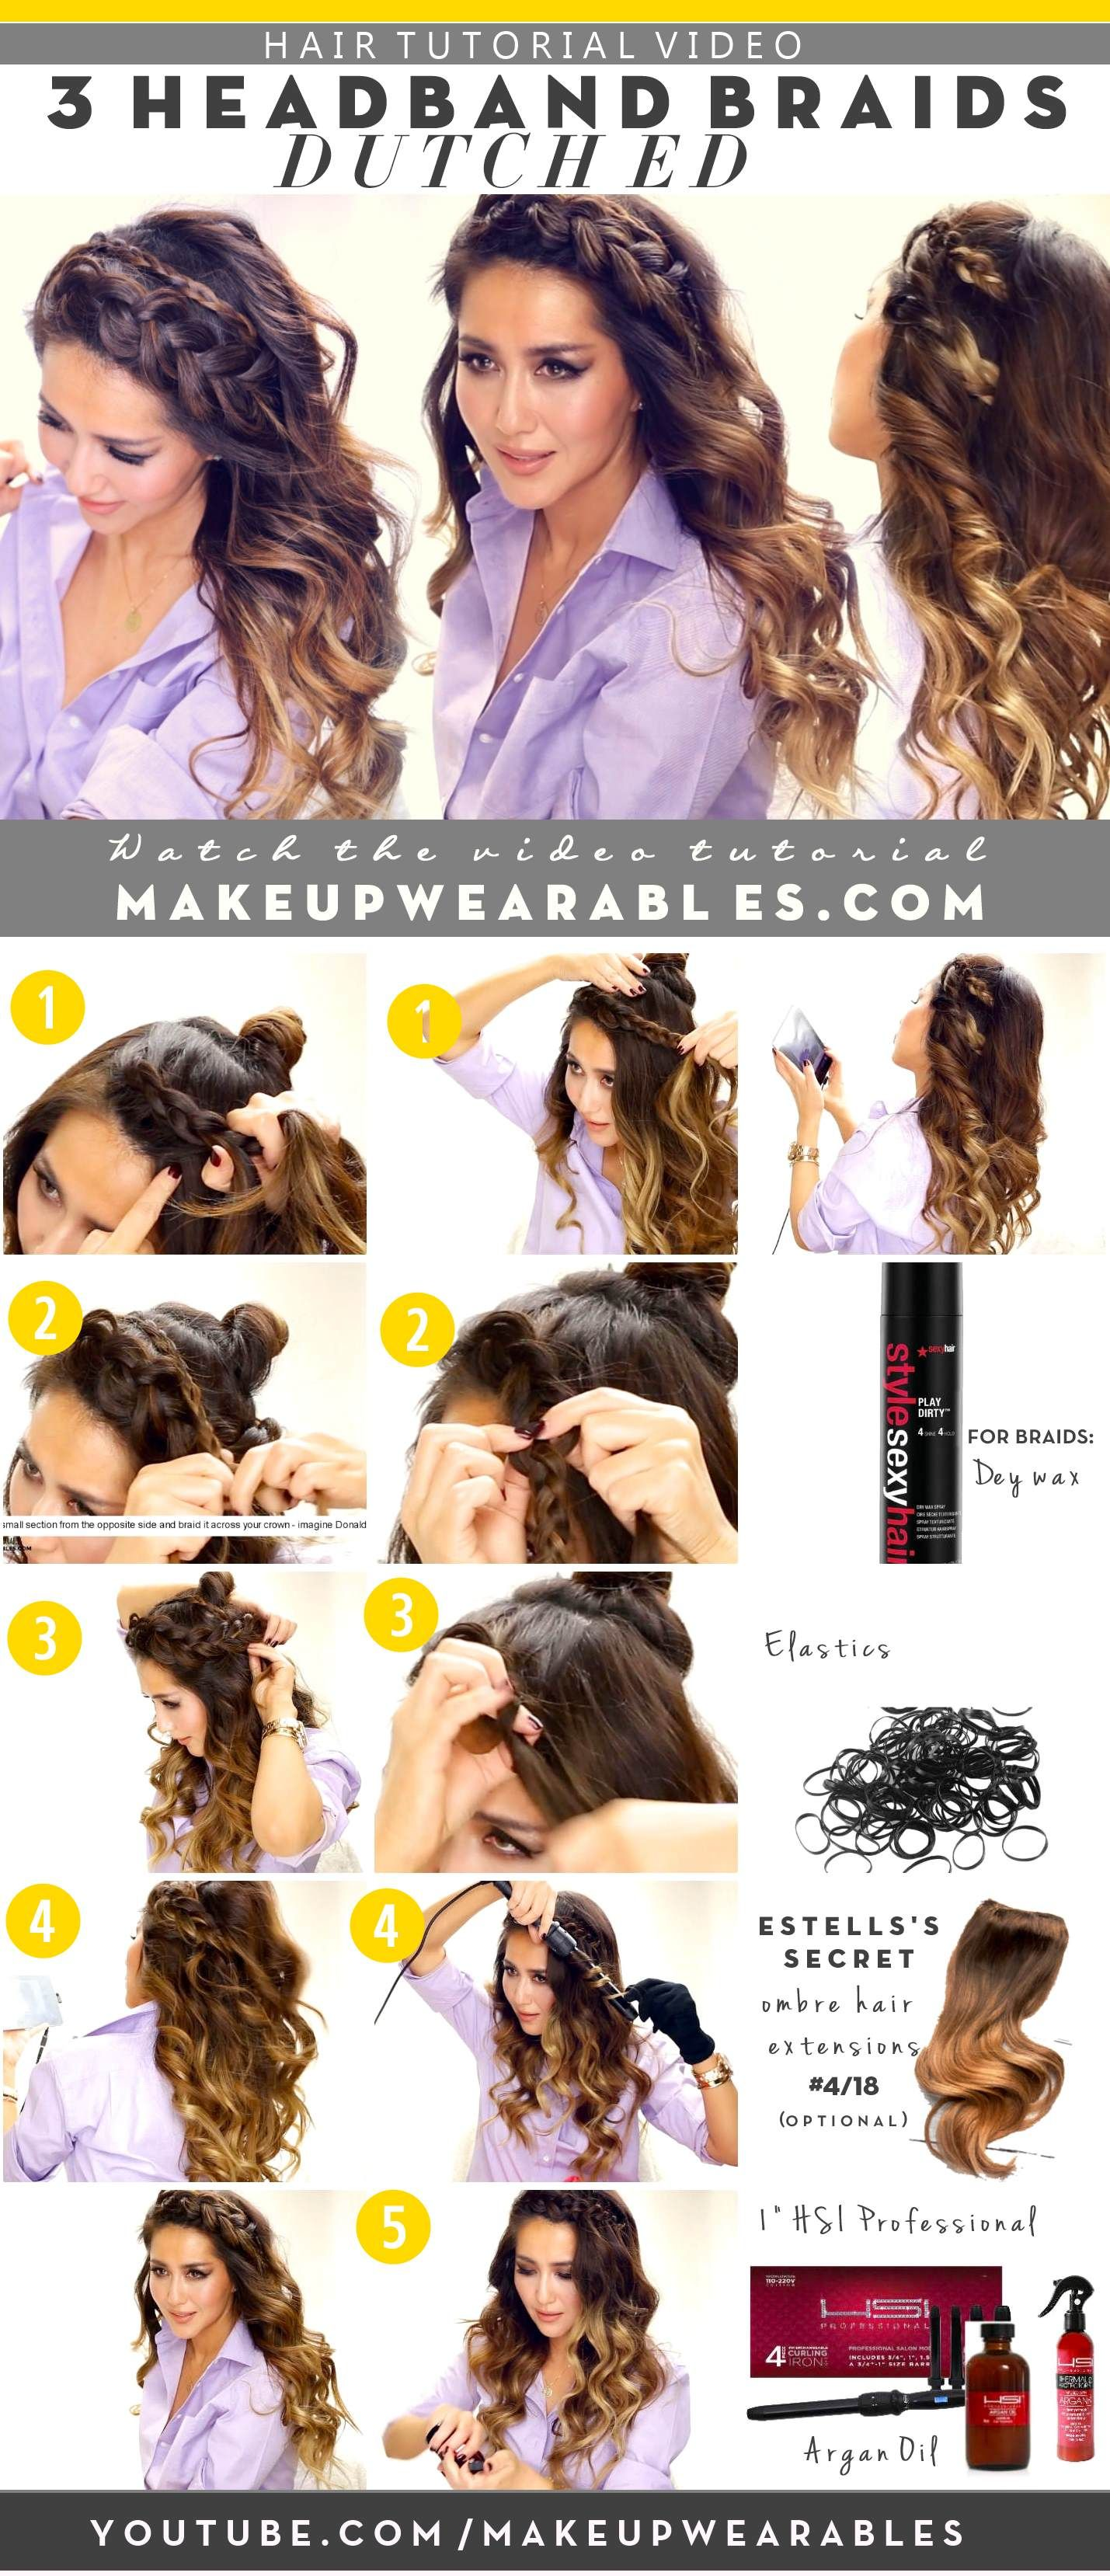 How to quick and easy headband braids everyday halfupdo